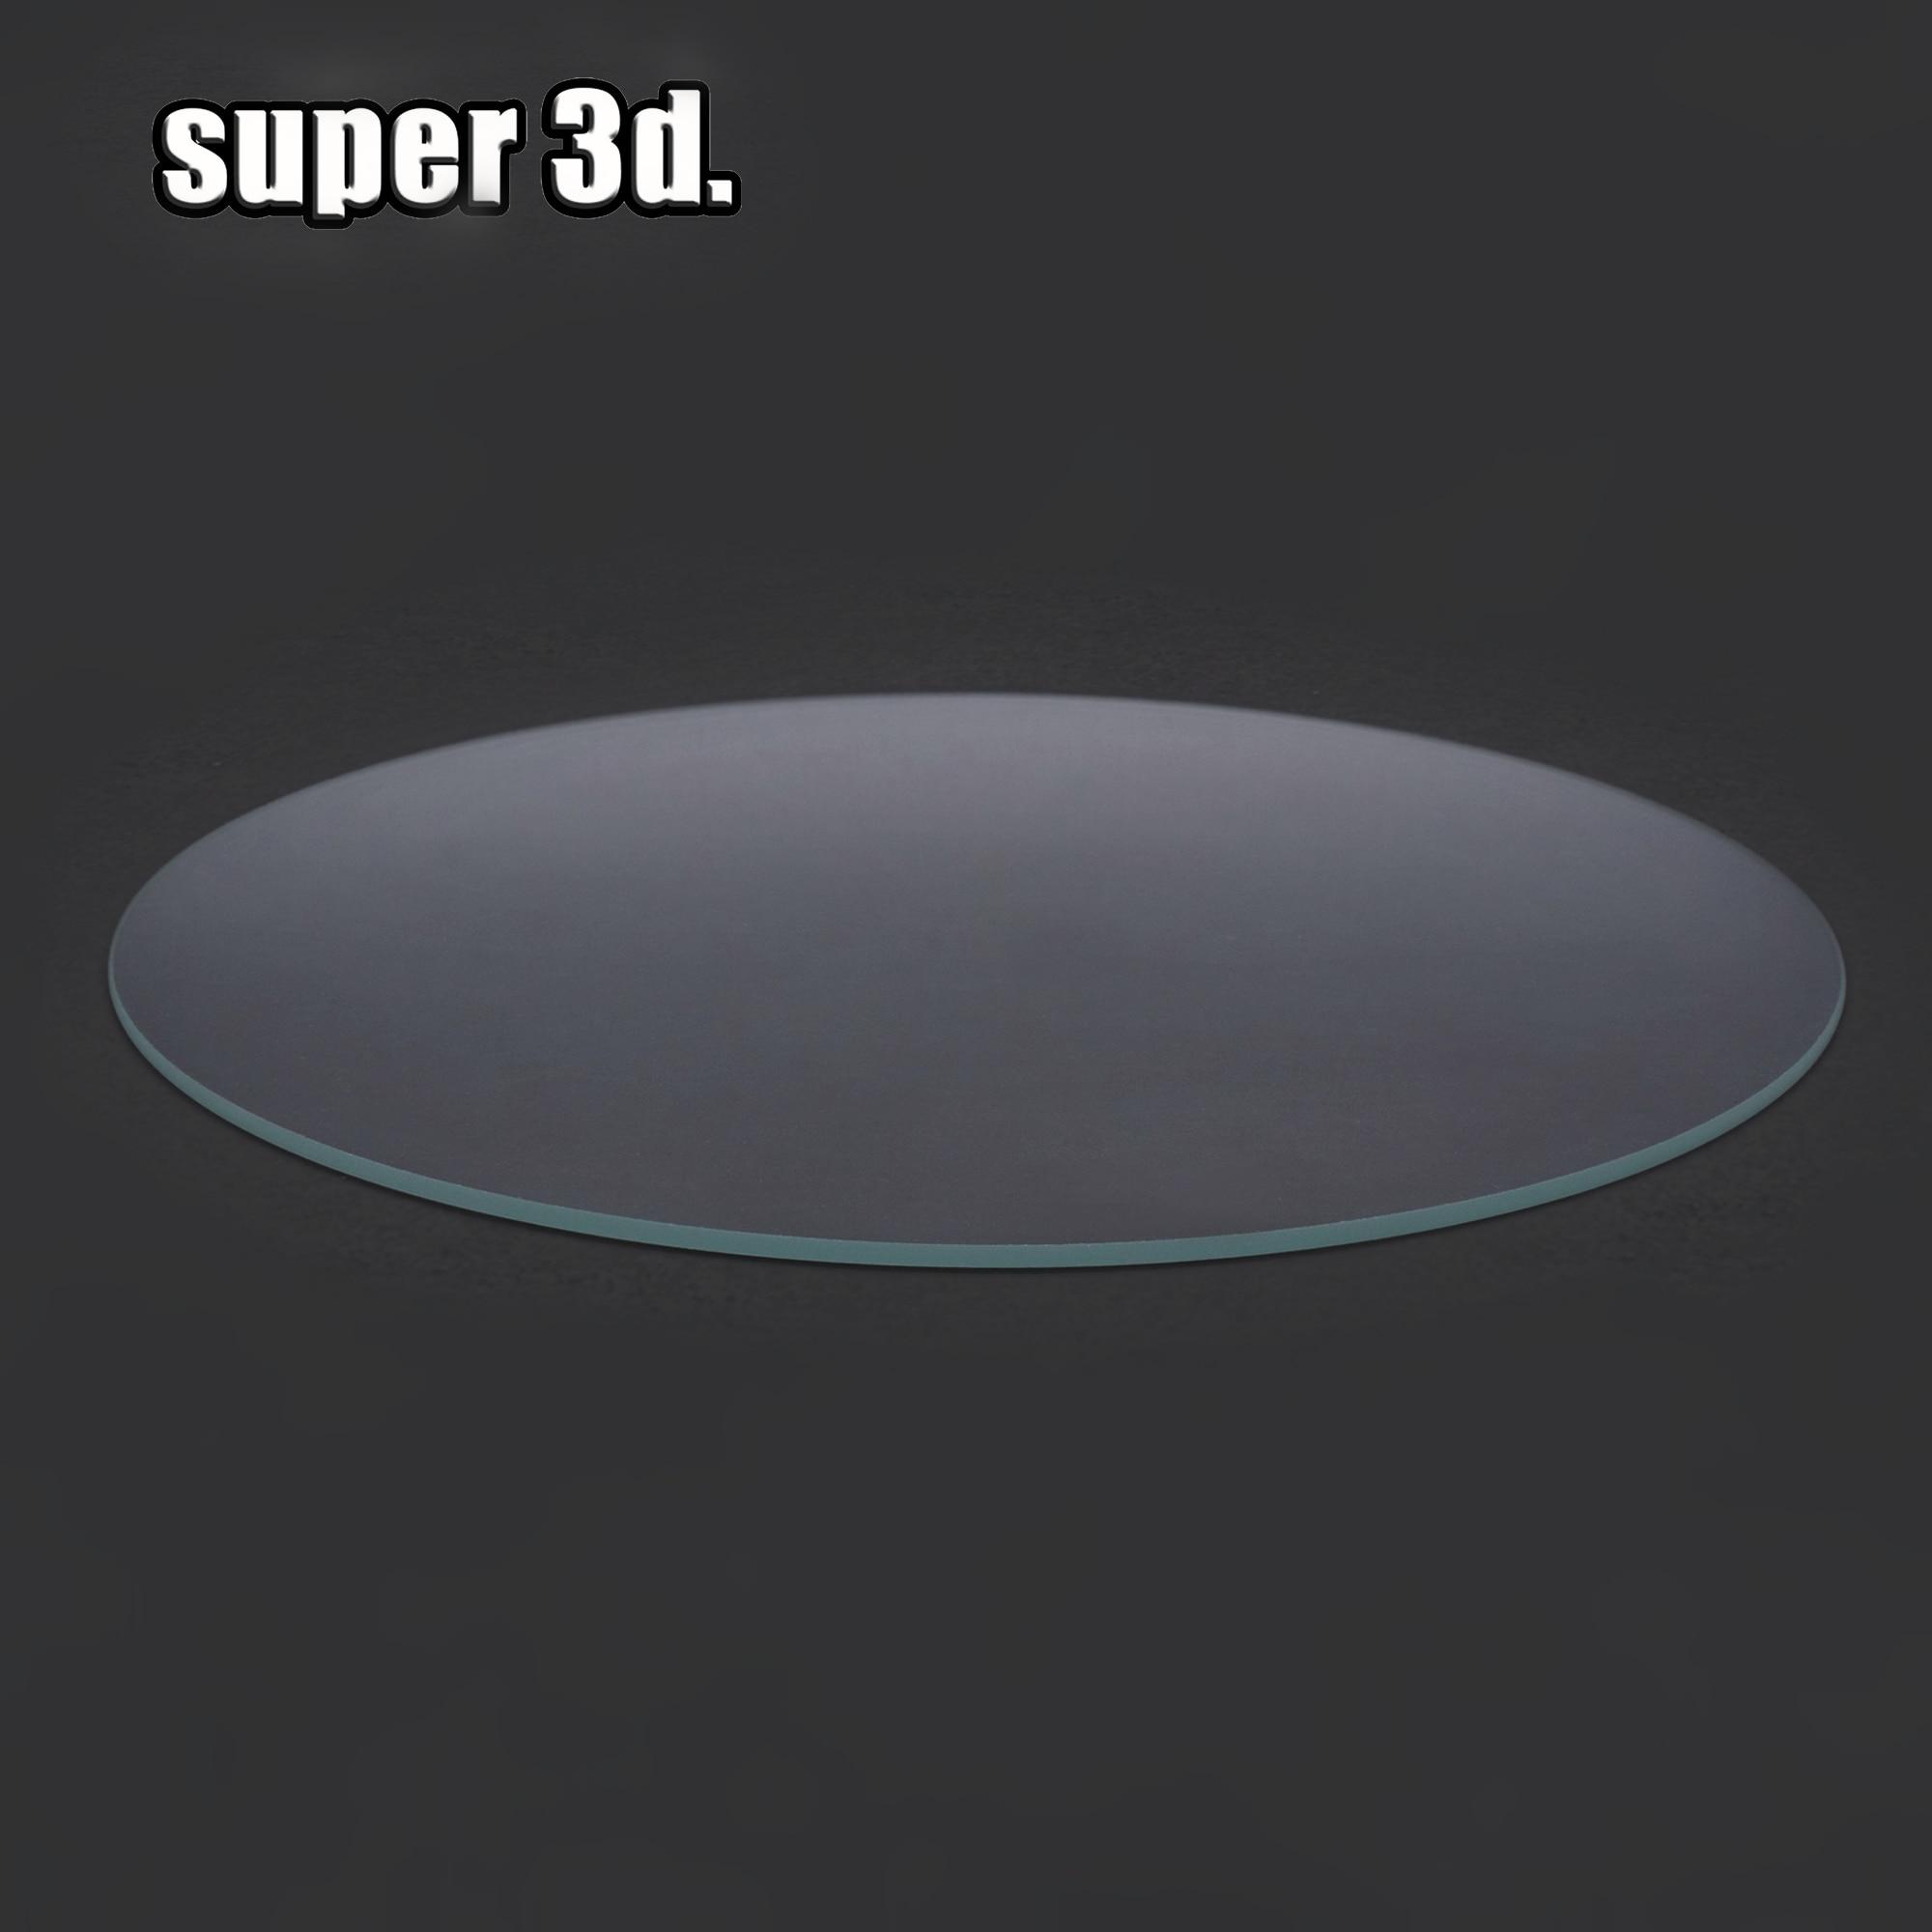 lowest price ANYCUBIC Photon-S 3D Printer Dual Z axis Quick Slice 405nm Matrix UV Module SLA 3d Printer Resin Photon S Upgraded Impresora 3d